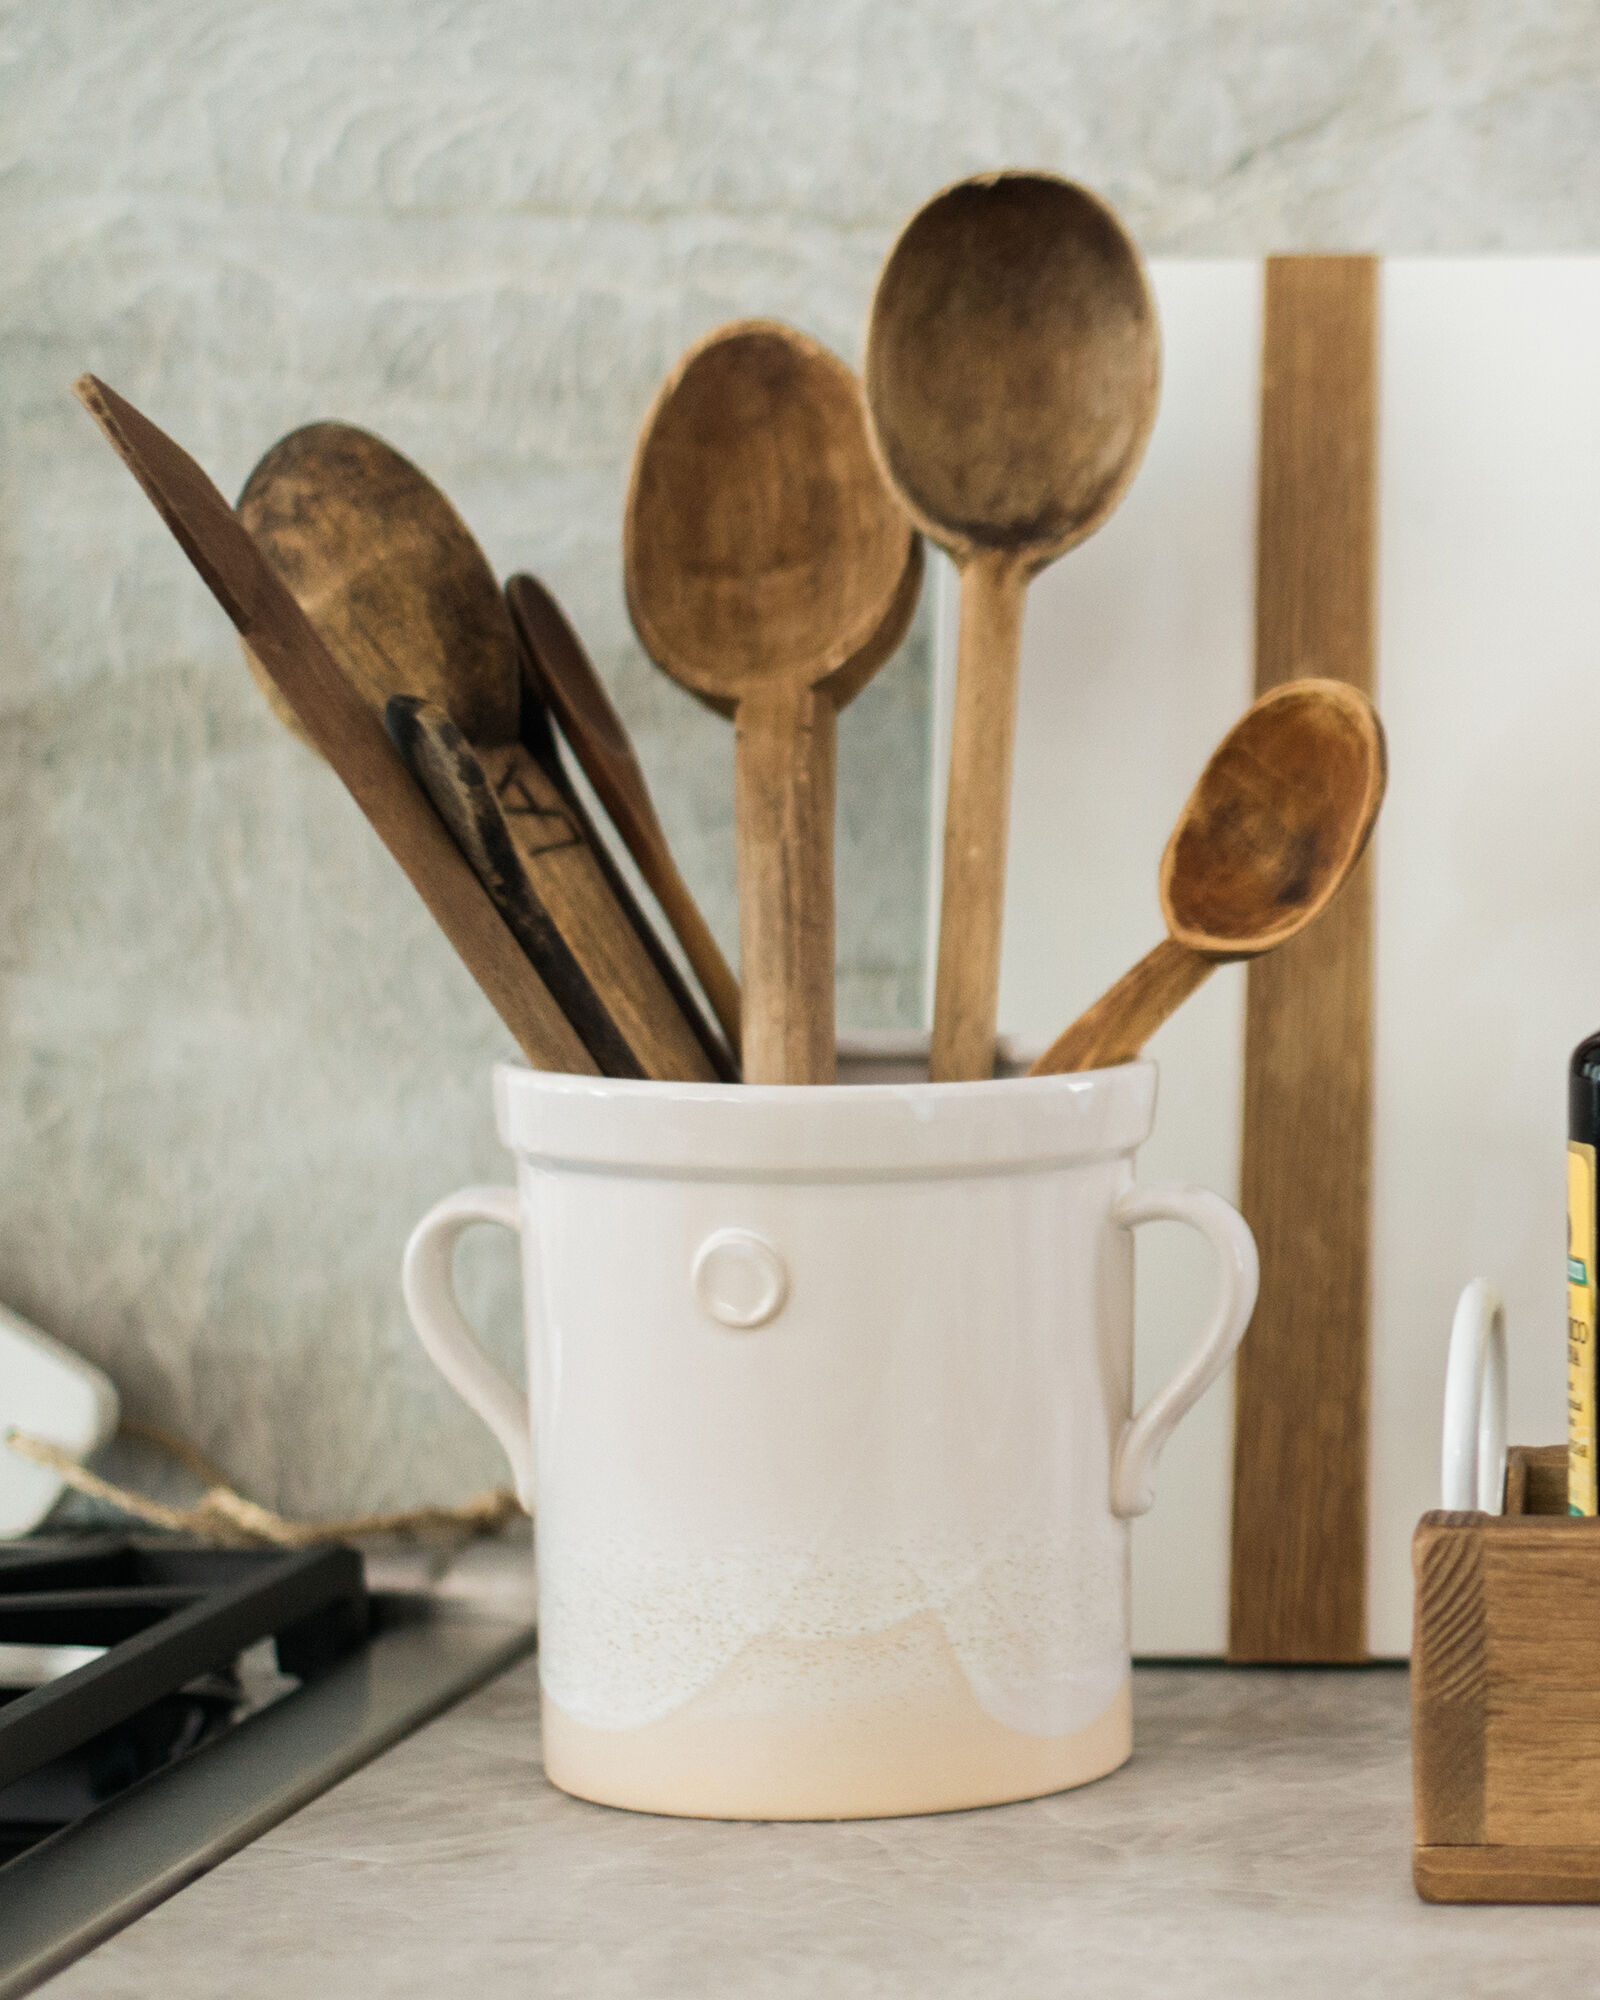 Etu home French utensil crock